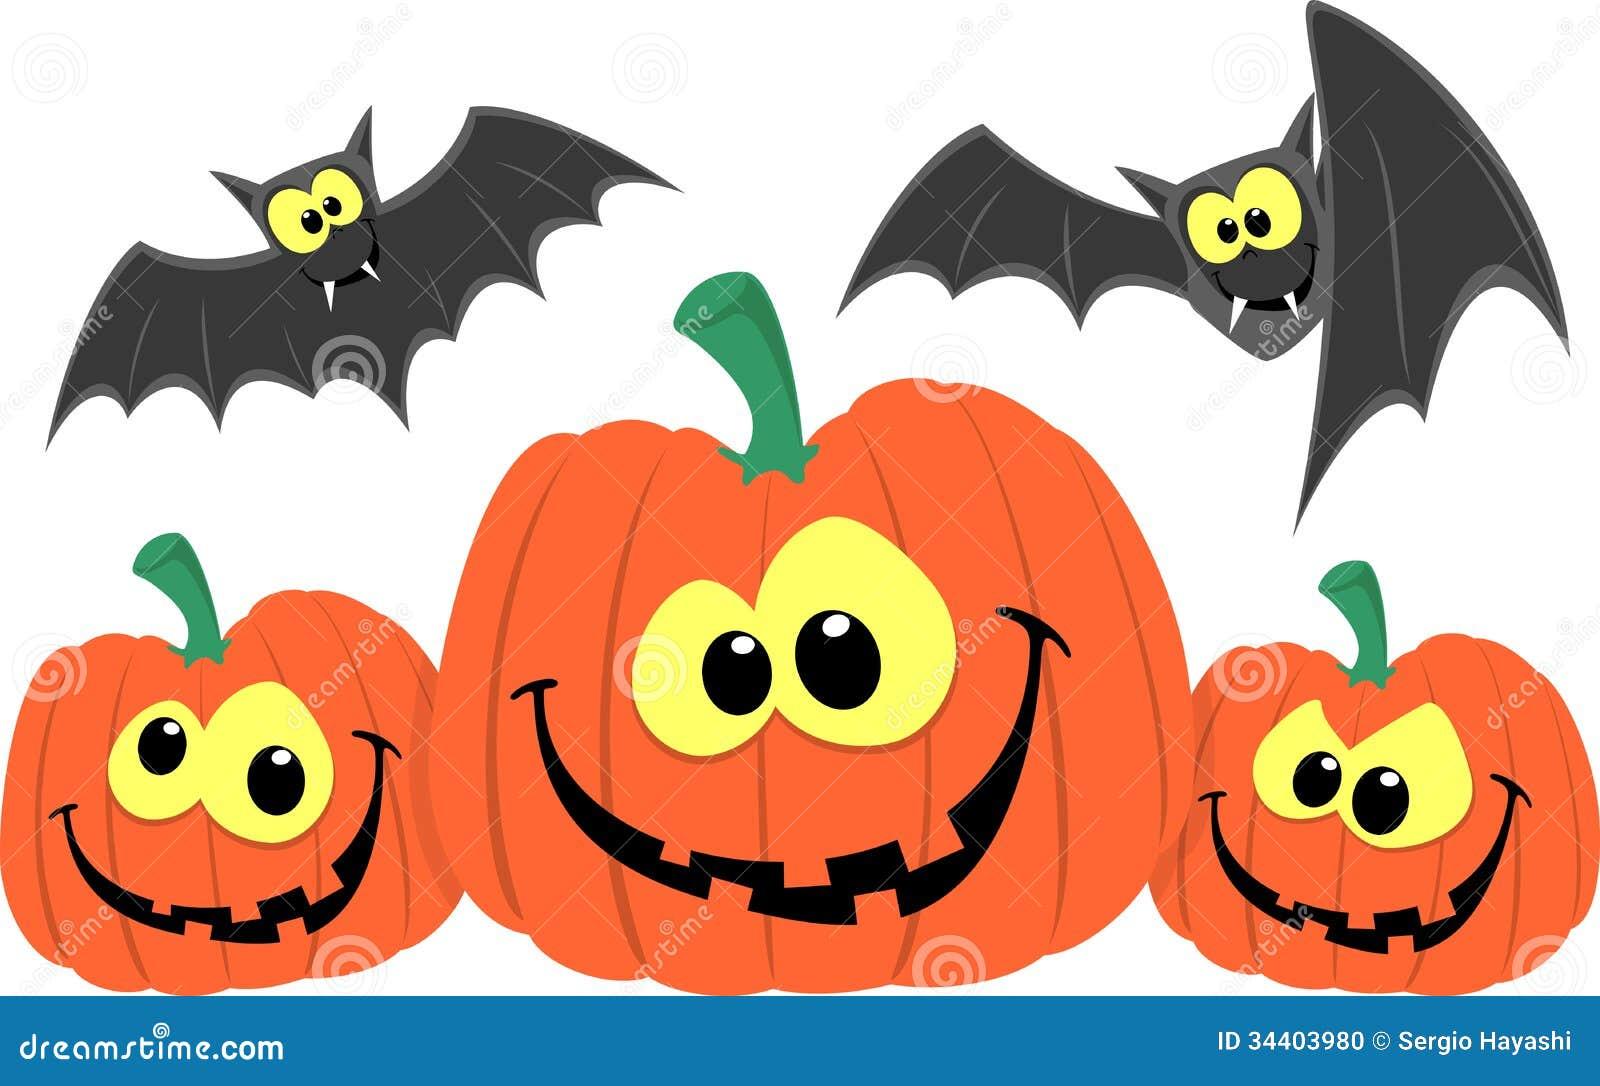 Funny pumpkins and bats cartoon stock vector image 34403980 for Funny pumpkin drawings